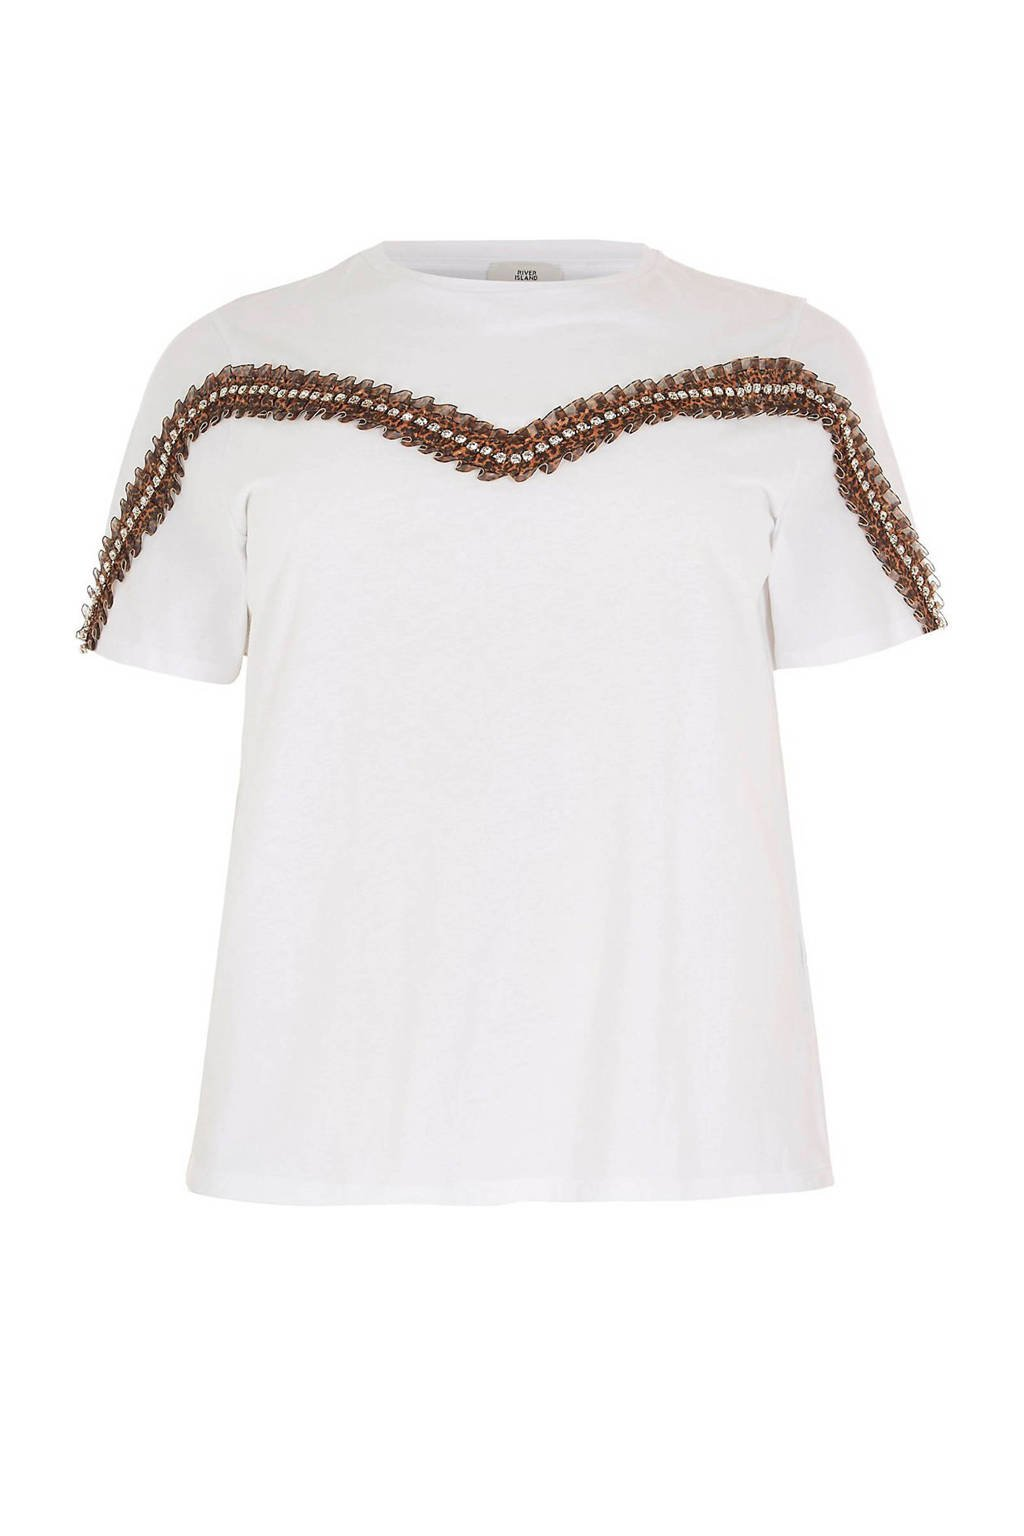 River Island Plus T-shirt met sierkralen wit, Wit